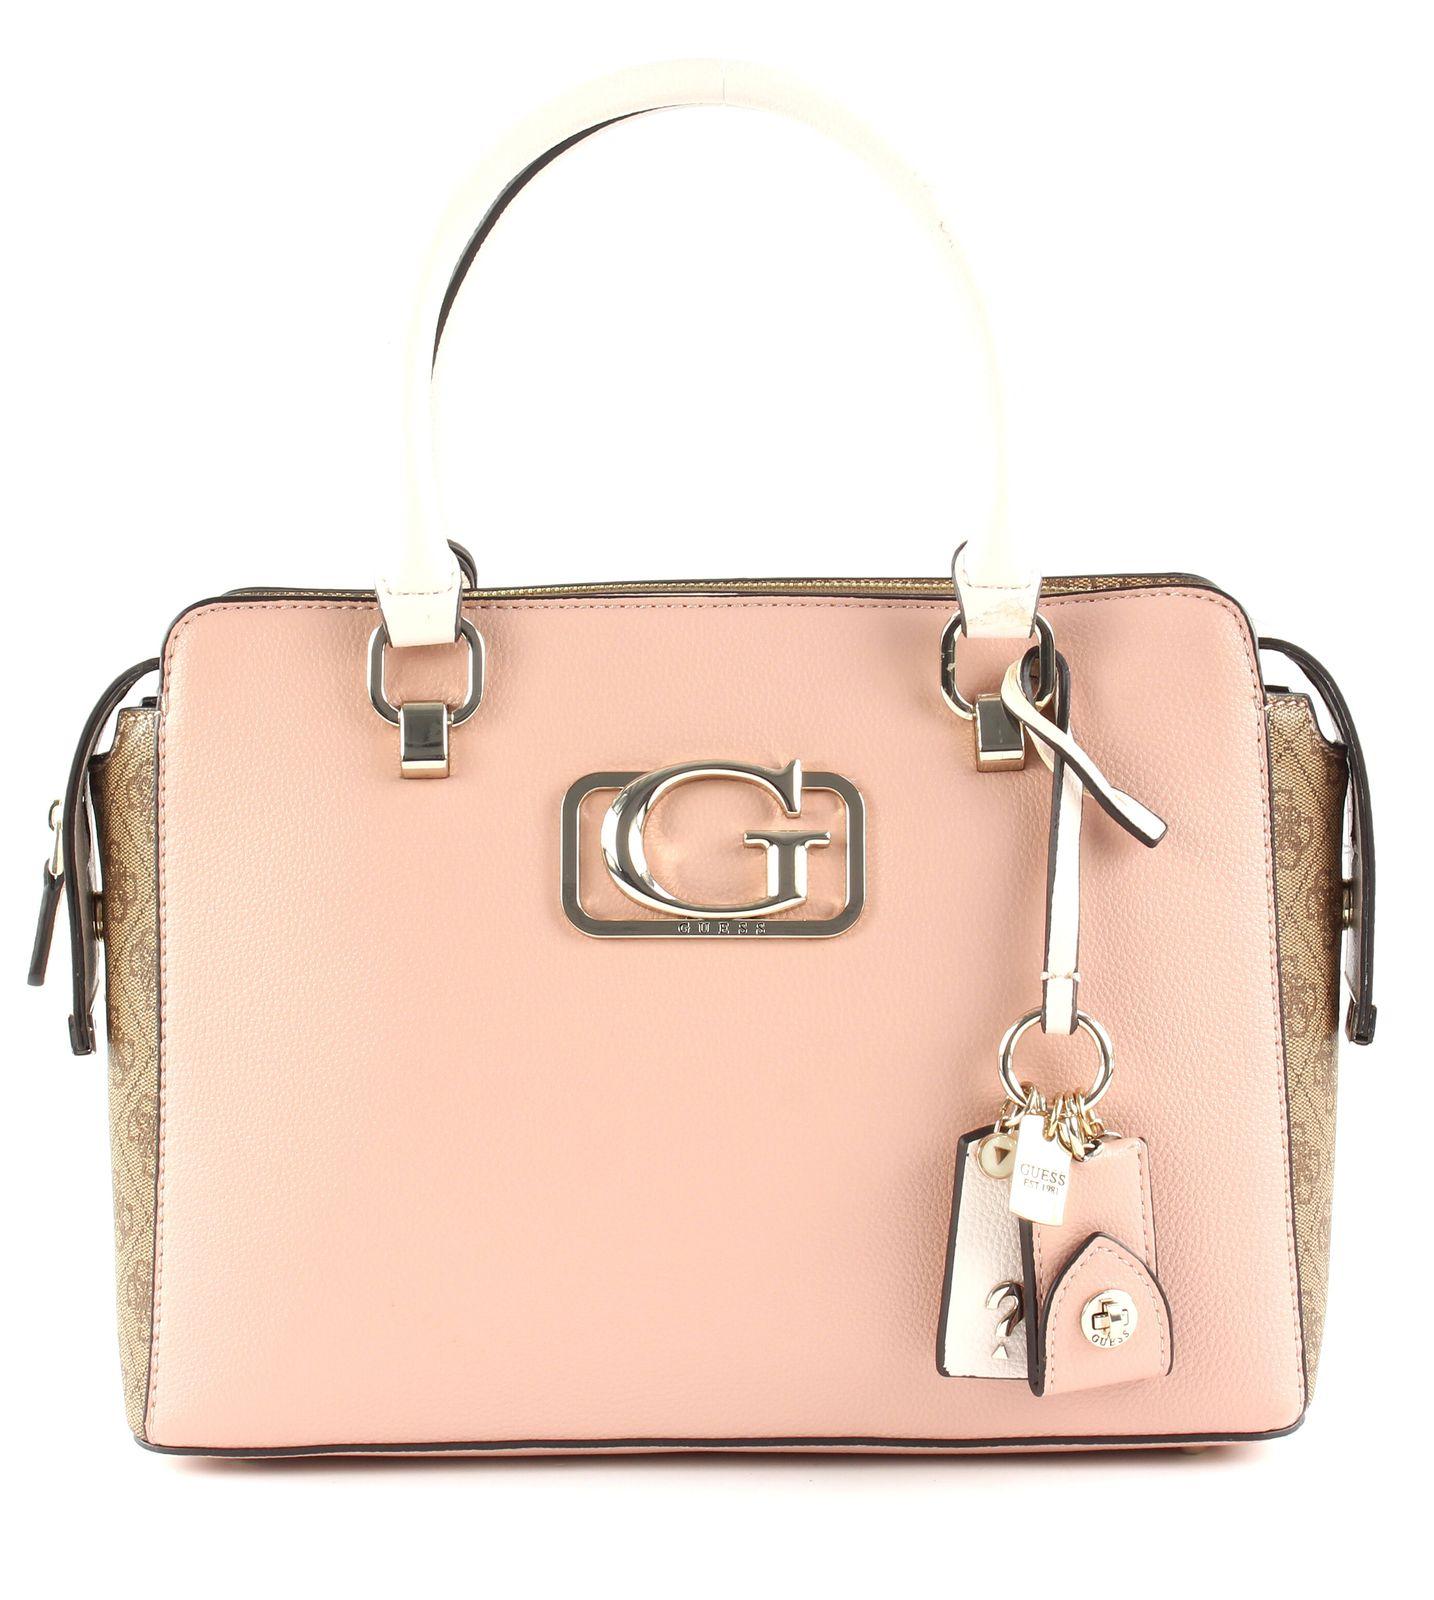 Annarita Girlfriend Satchel Bags Top Handle Bags Pink GUESS